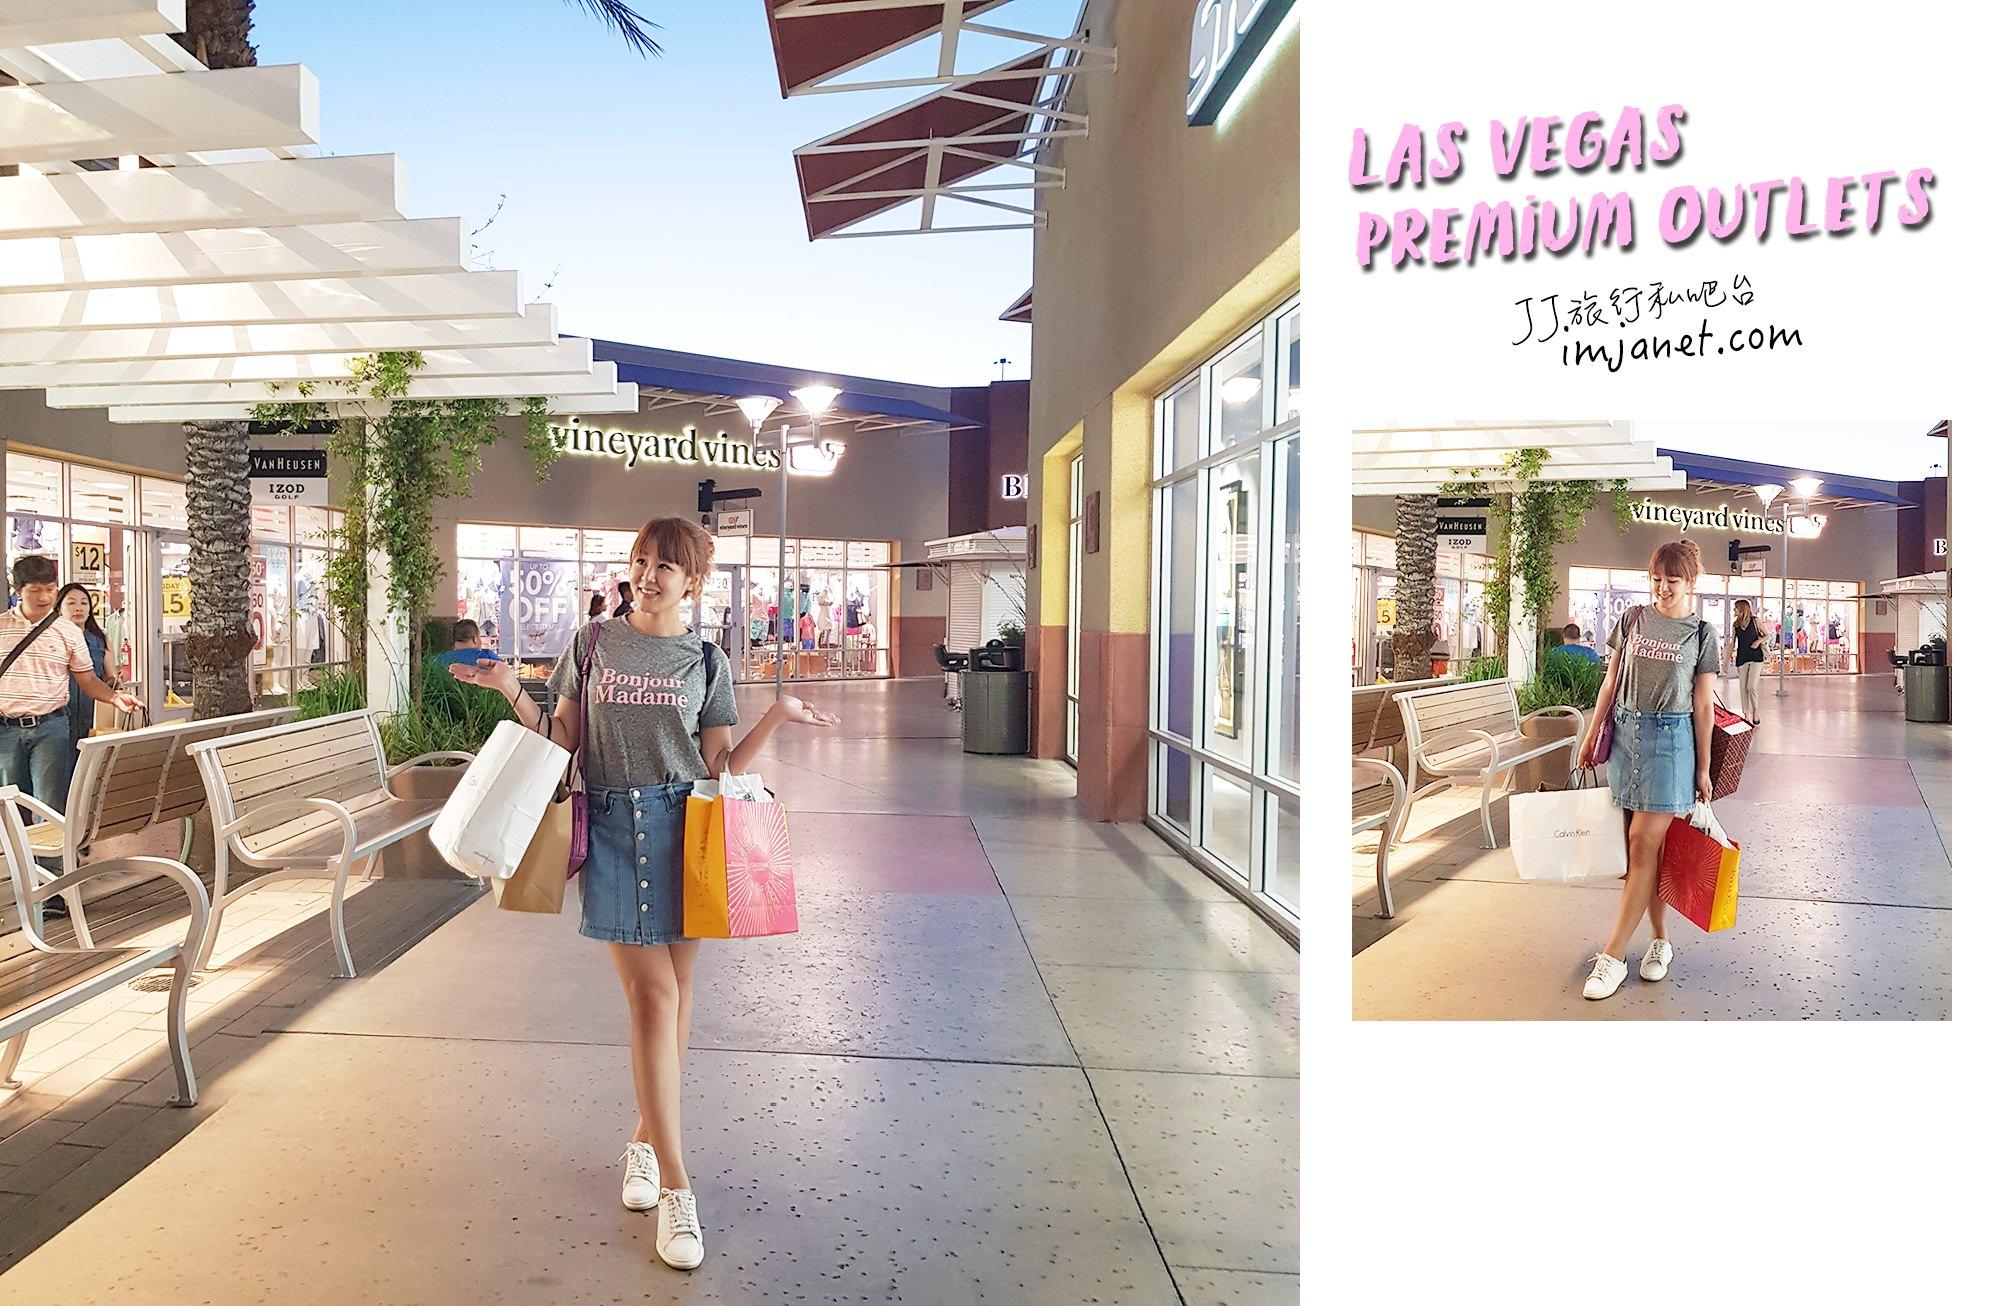 美國拉斯維加斯 Las Vegas North Premium Outlets購物必買品牌